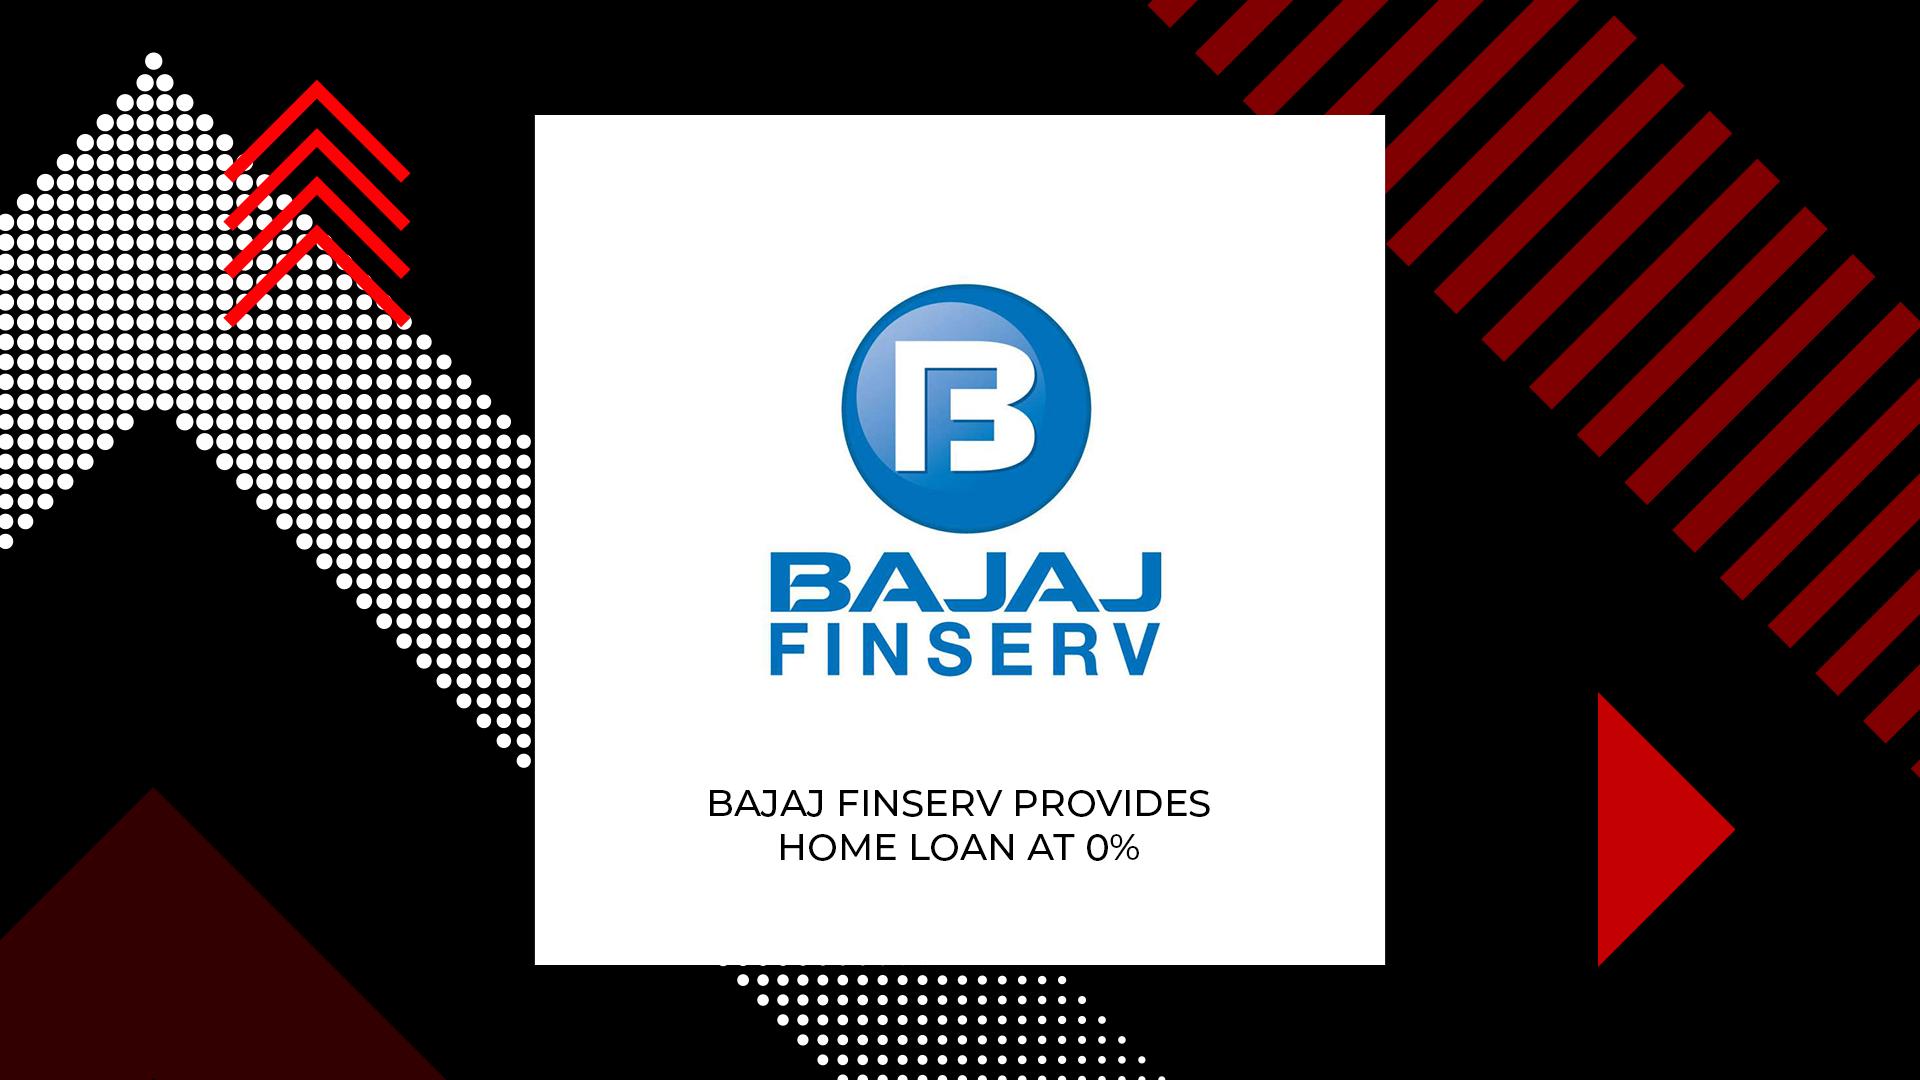 Bajaj Finserv Offers New Home Loan at Zero Percent Processing Fee